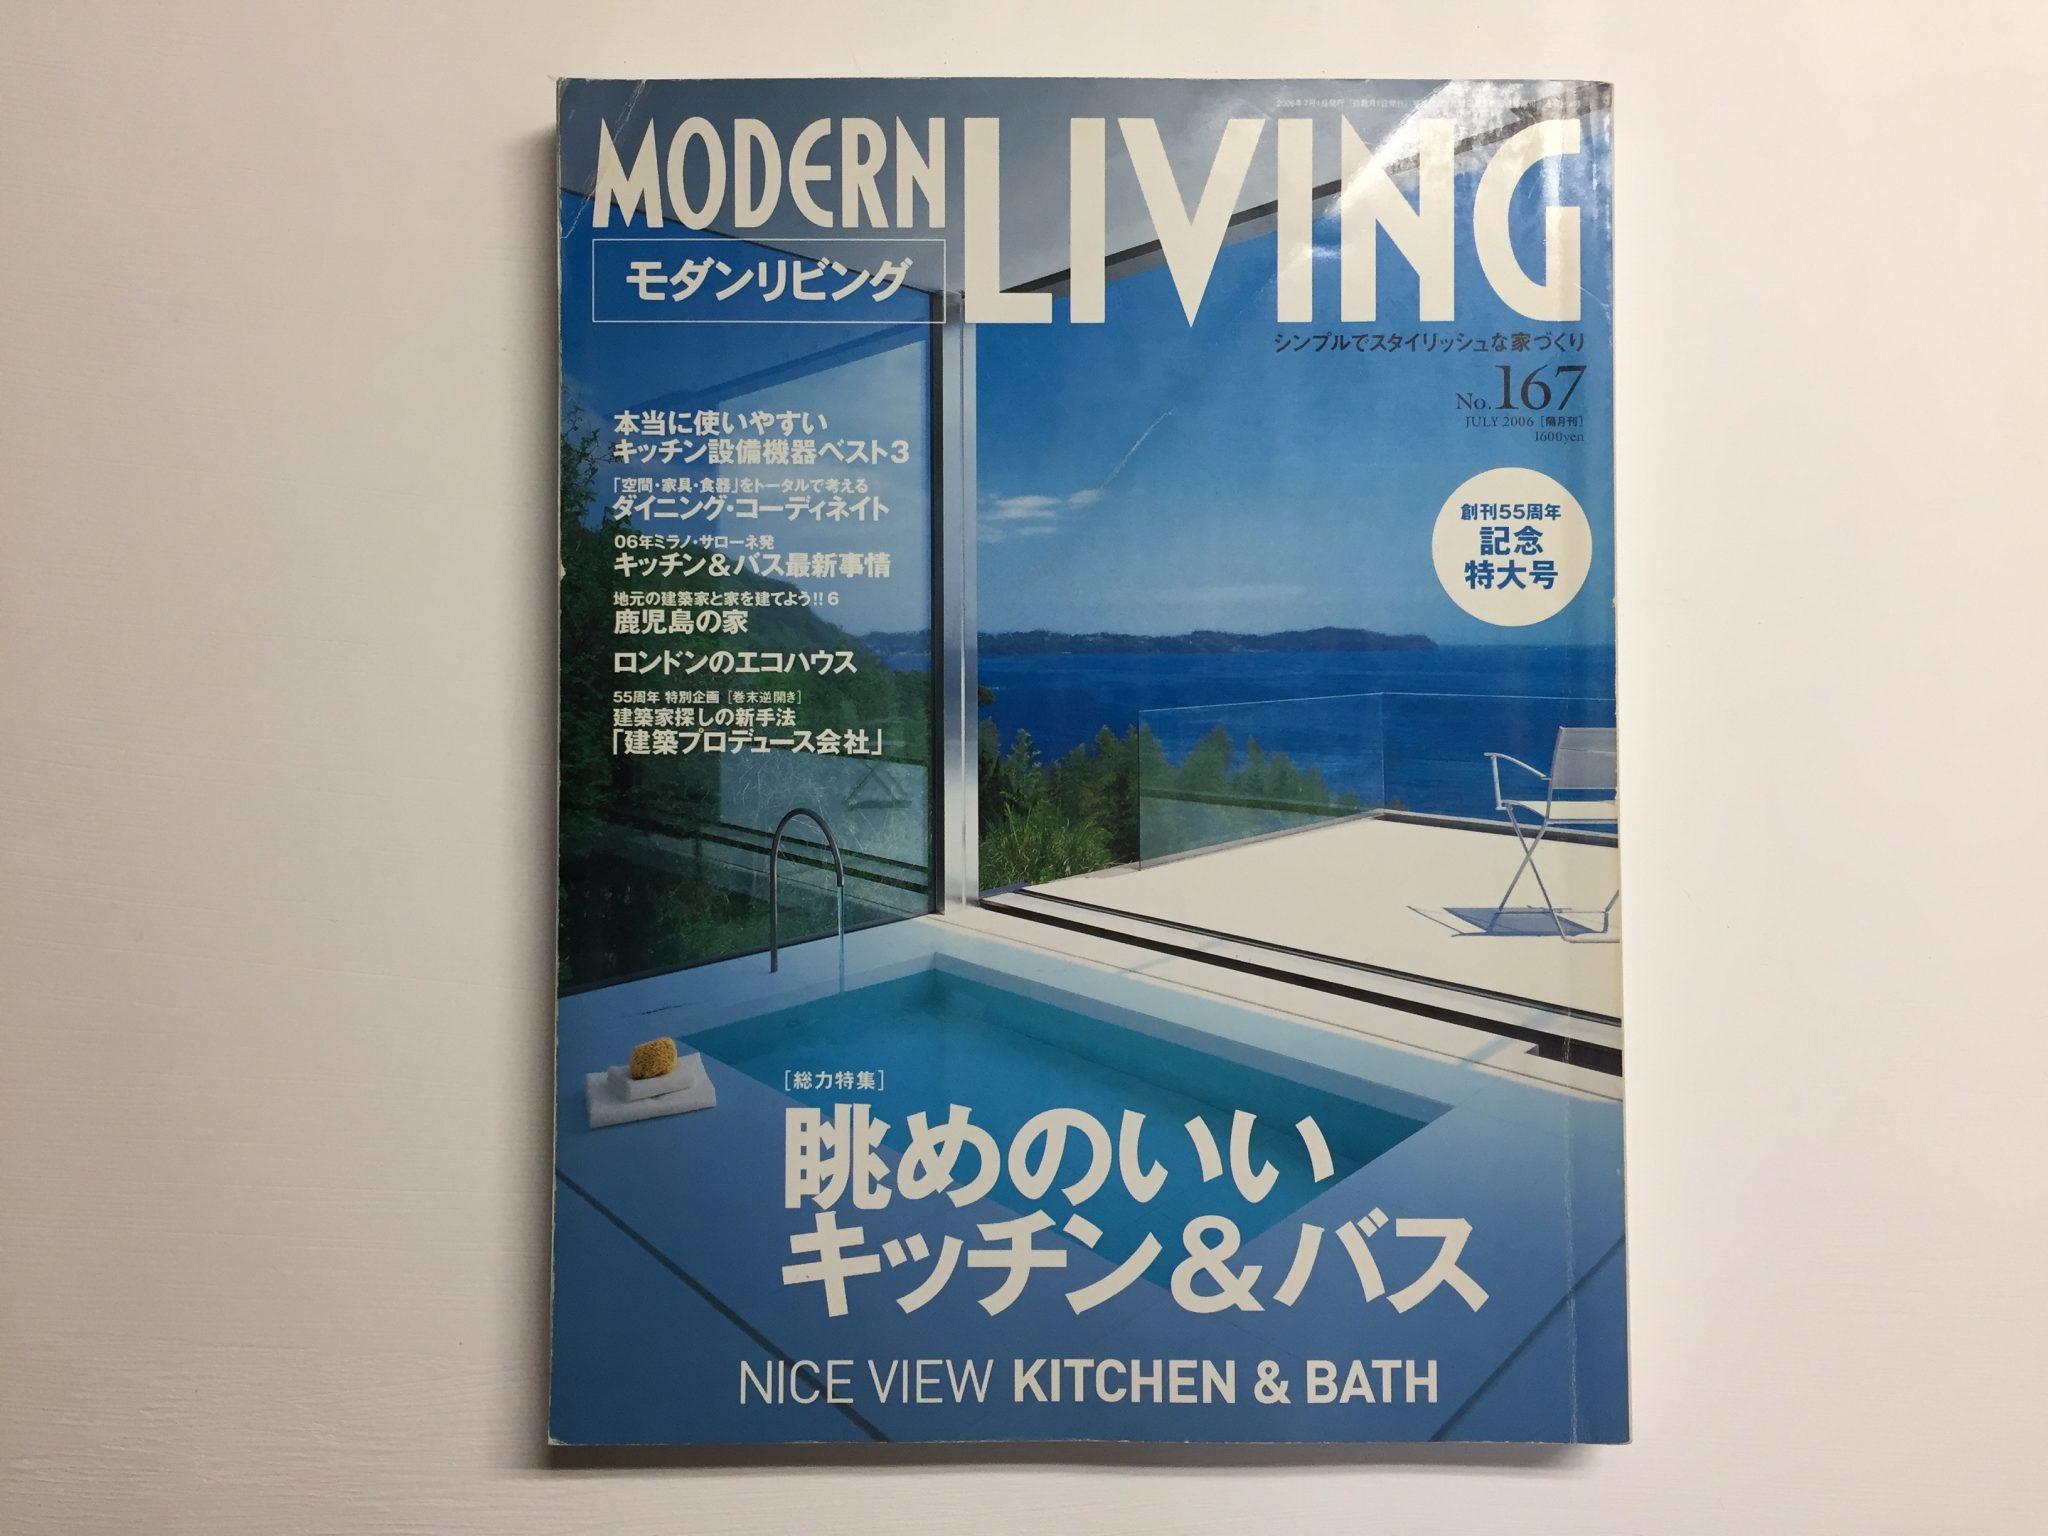 Modern Living No.167